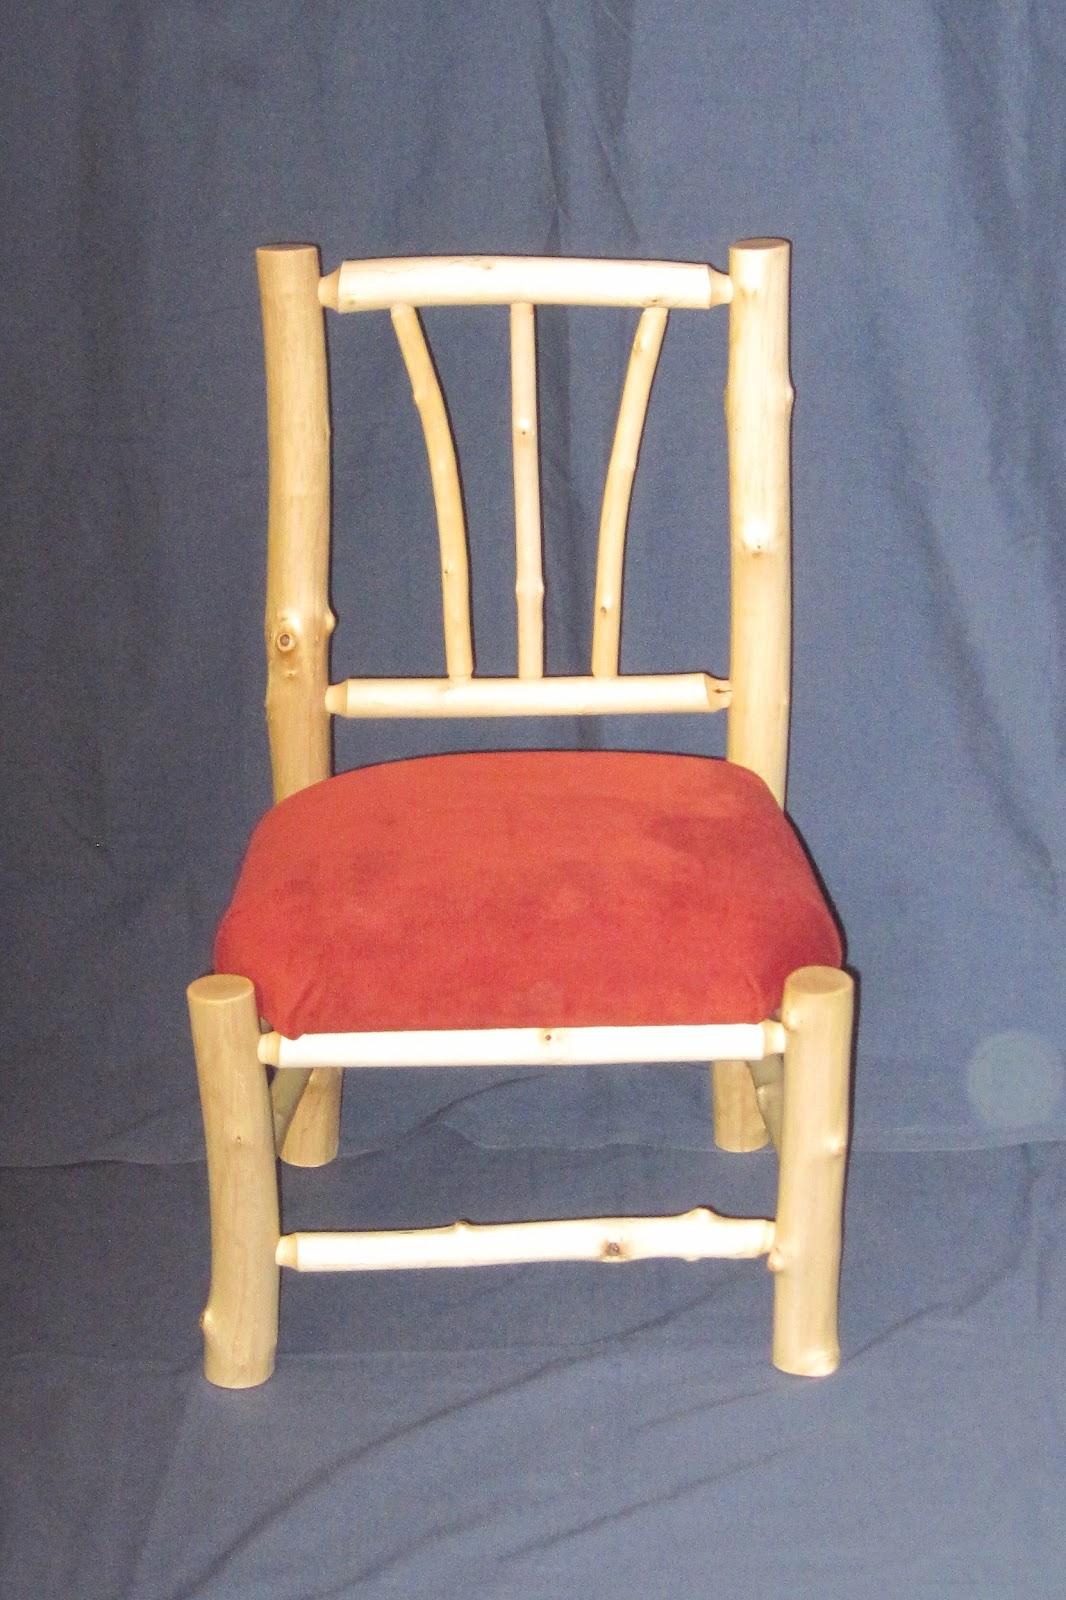 Peeled Maple Childu0027s Chair